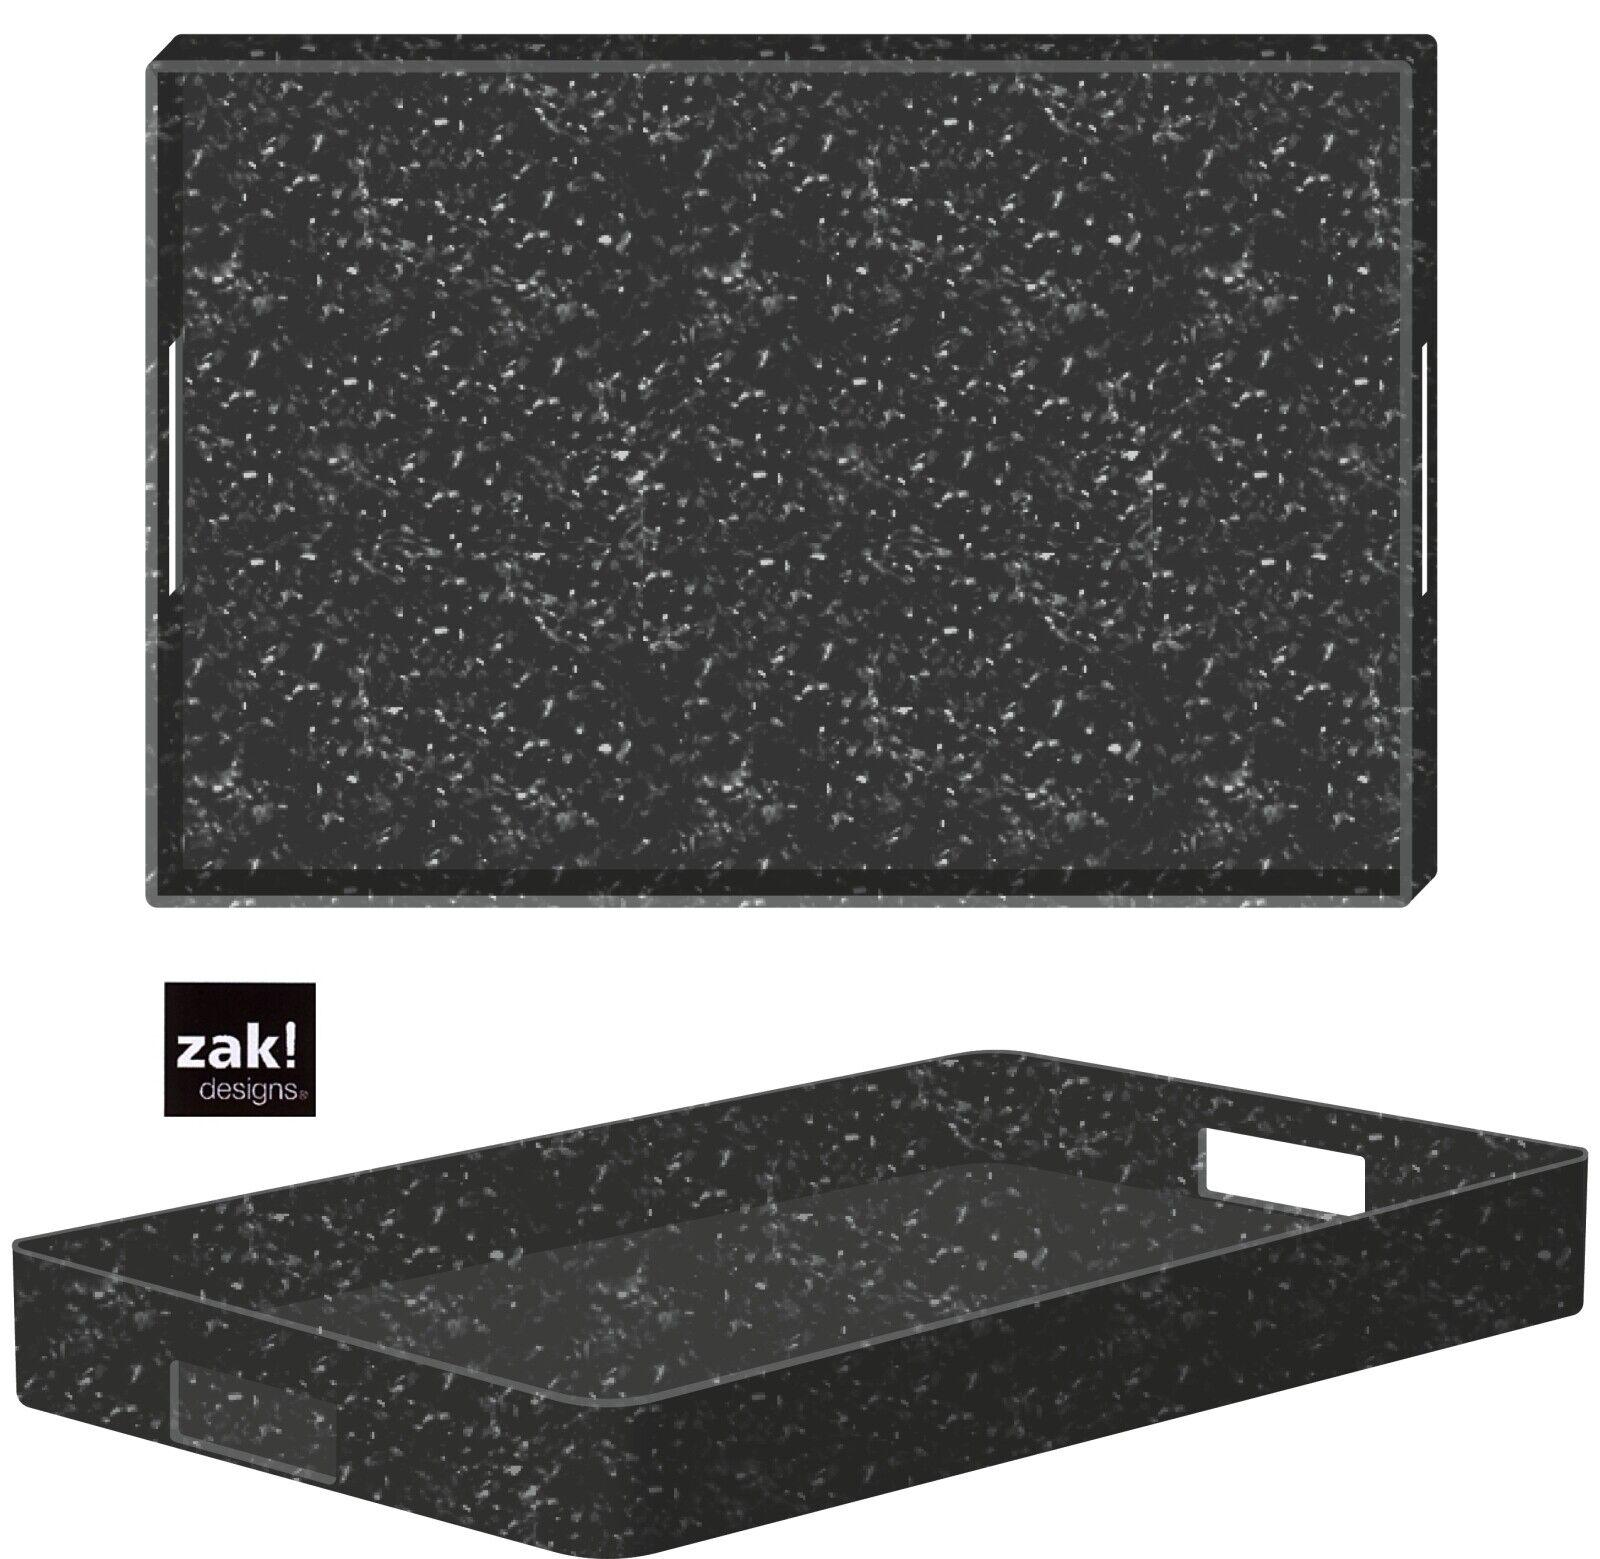 Zak Designs XL Tray Mono Grey Matt melamiert Rice Bran 48x31 Garden Tray